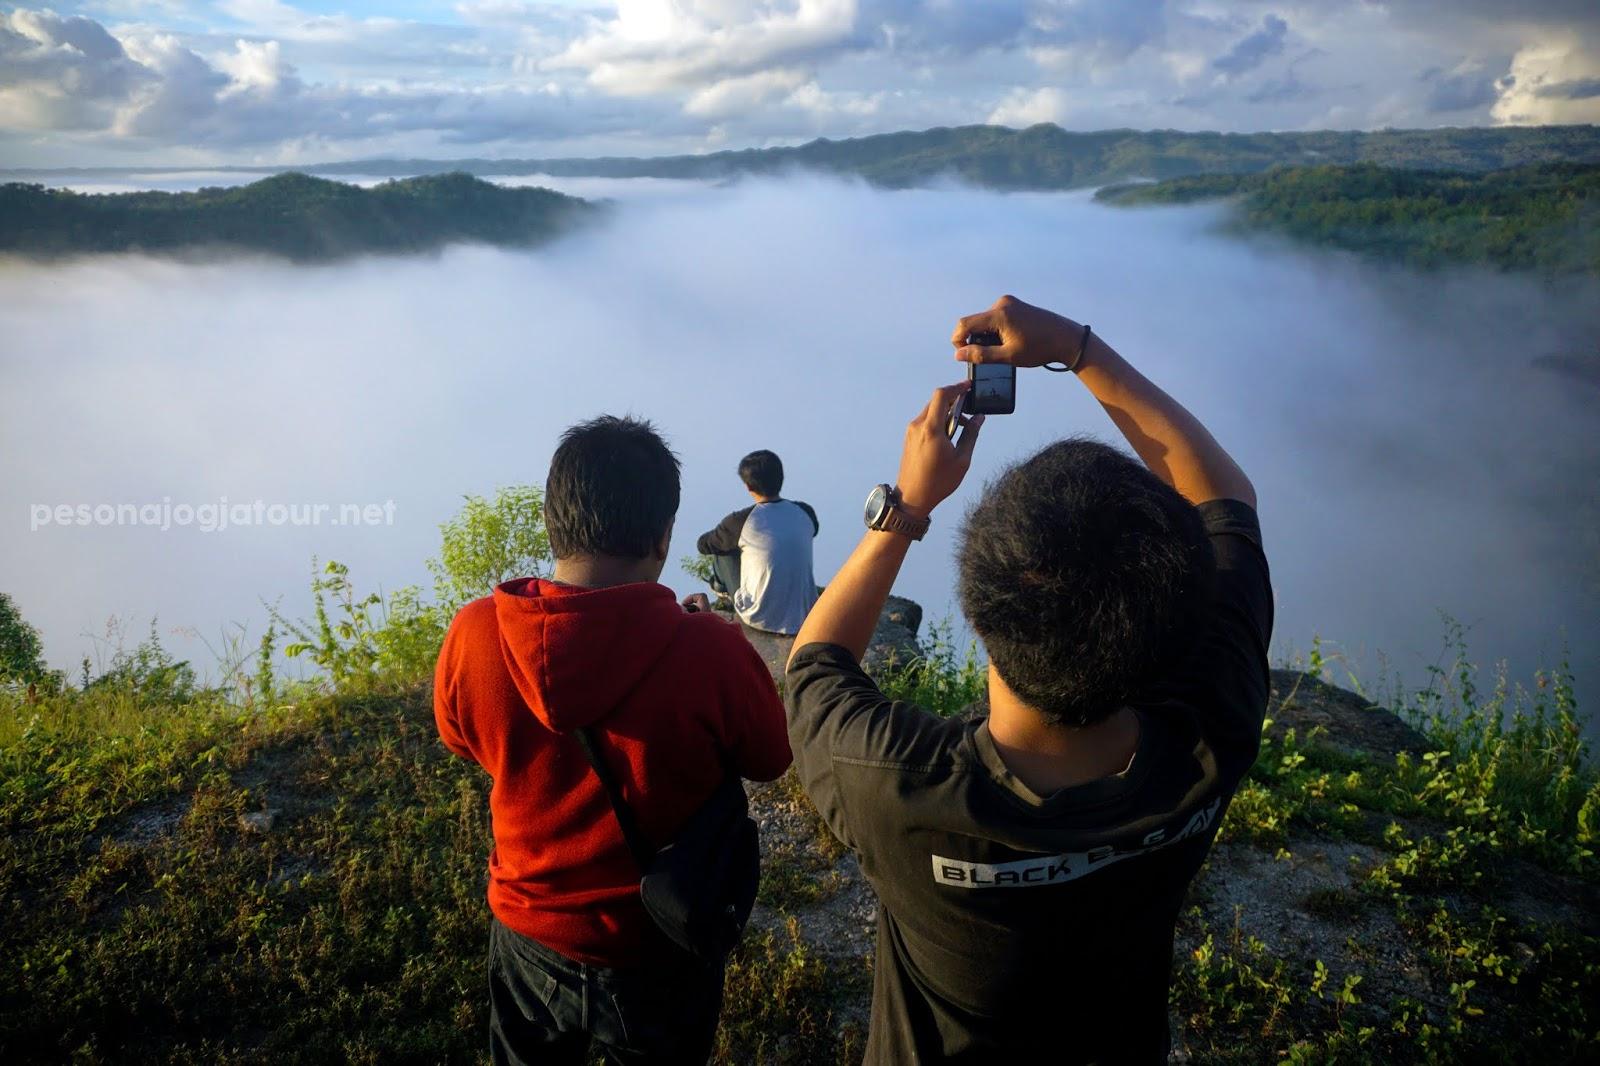 Wisata Jatisari Seropan